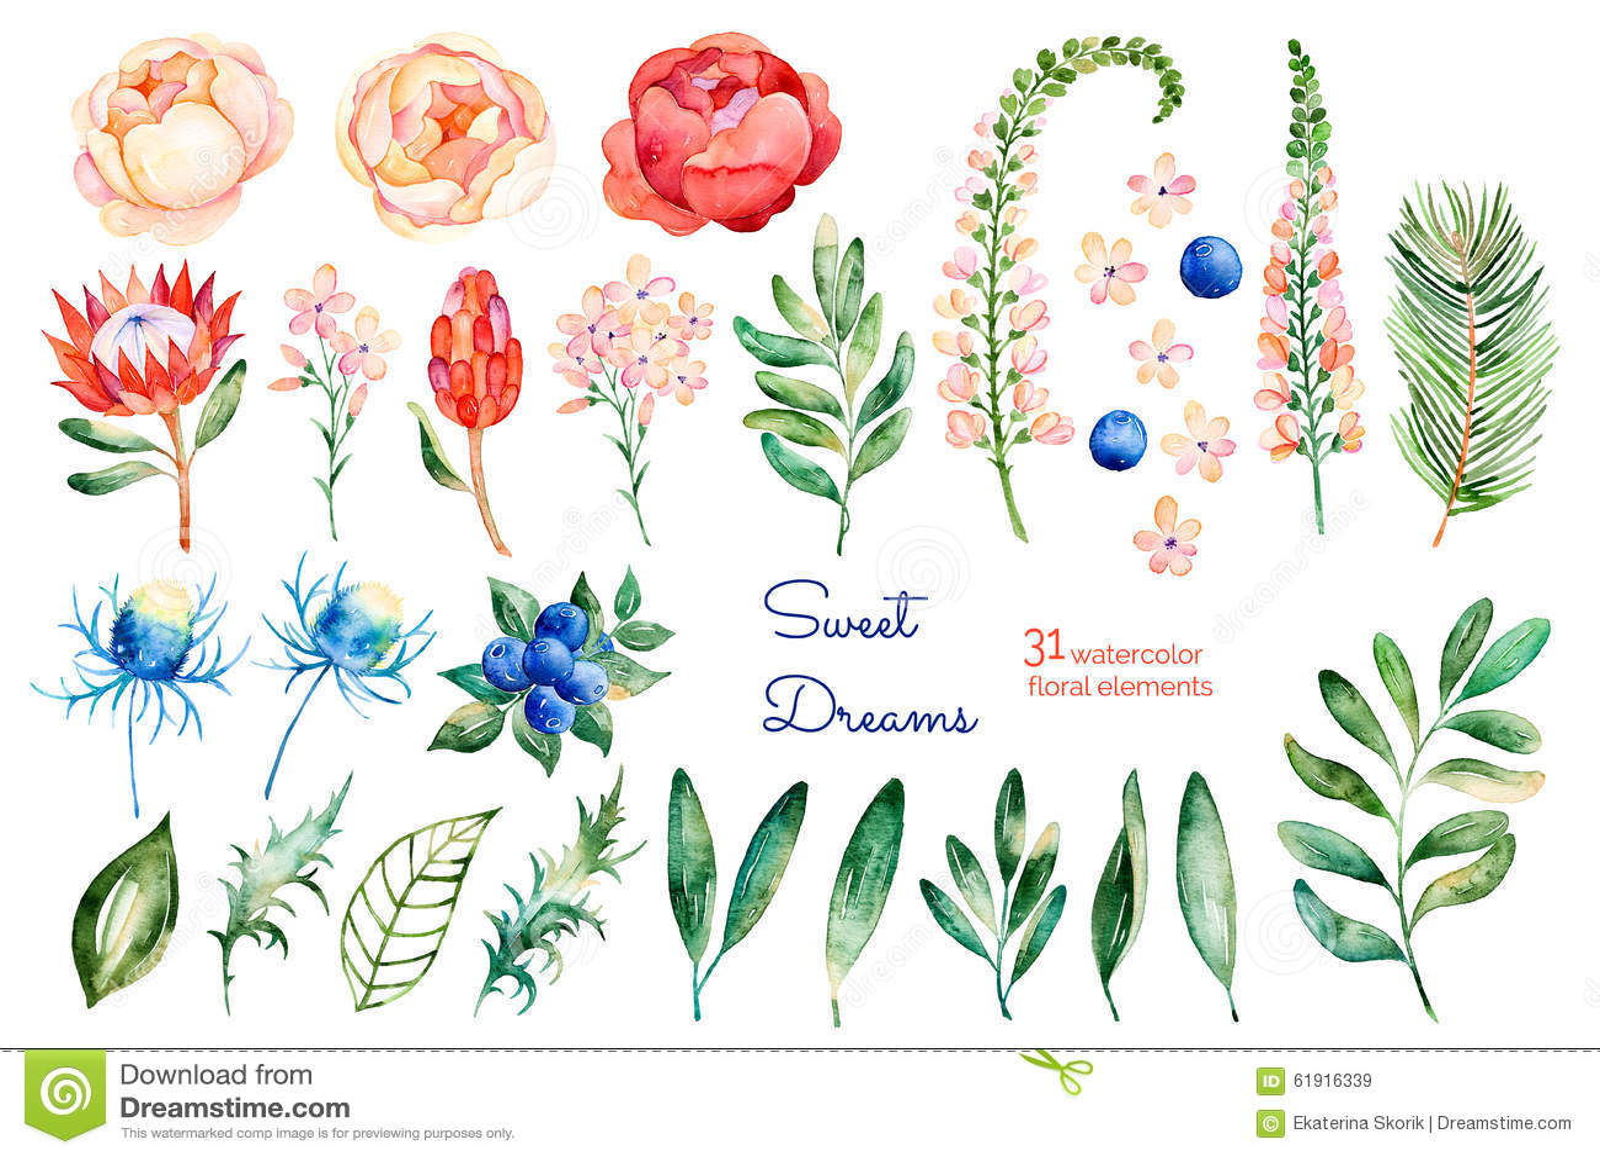 Design Your Own Garden Plans